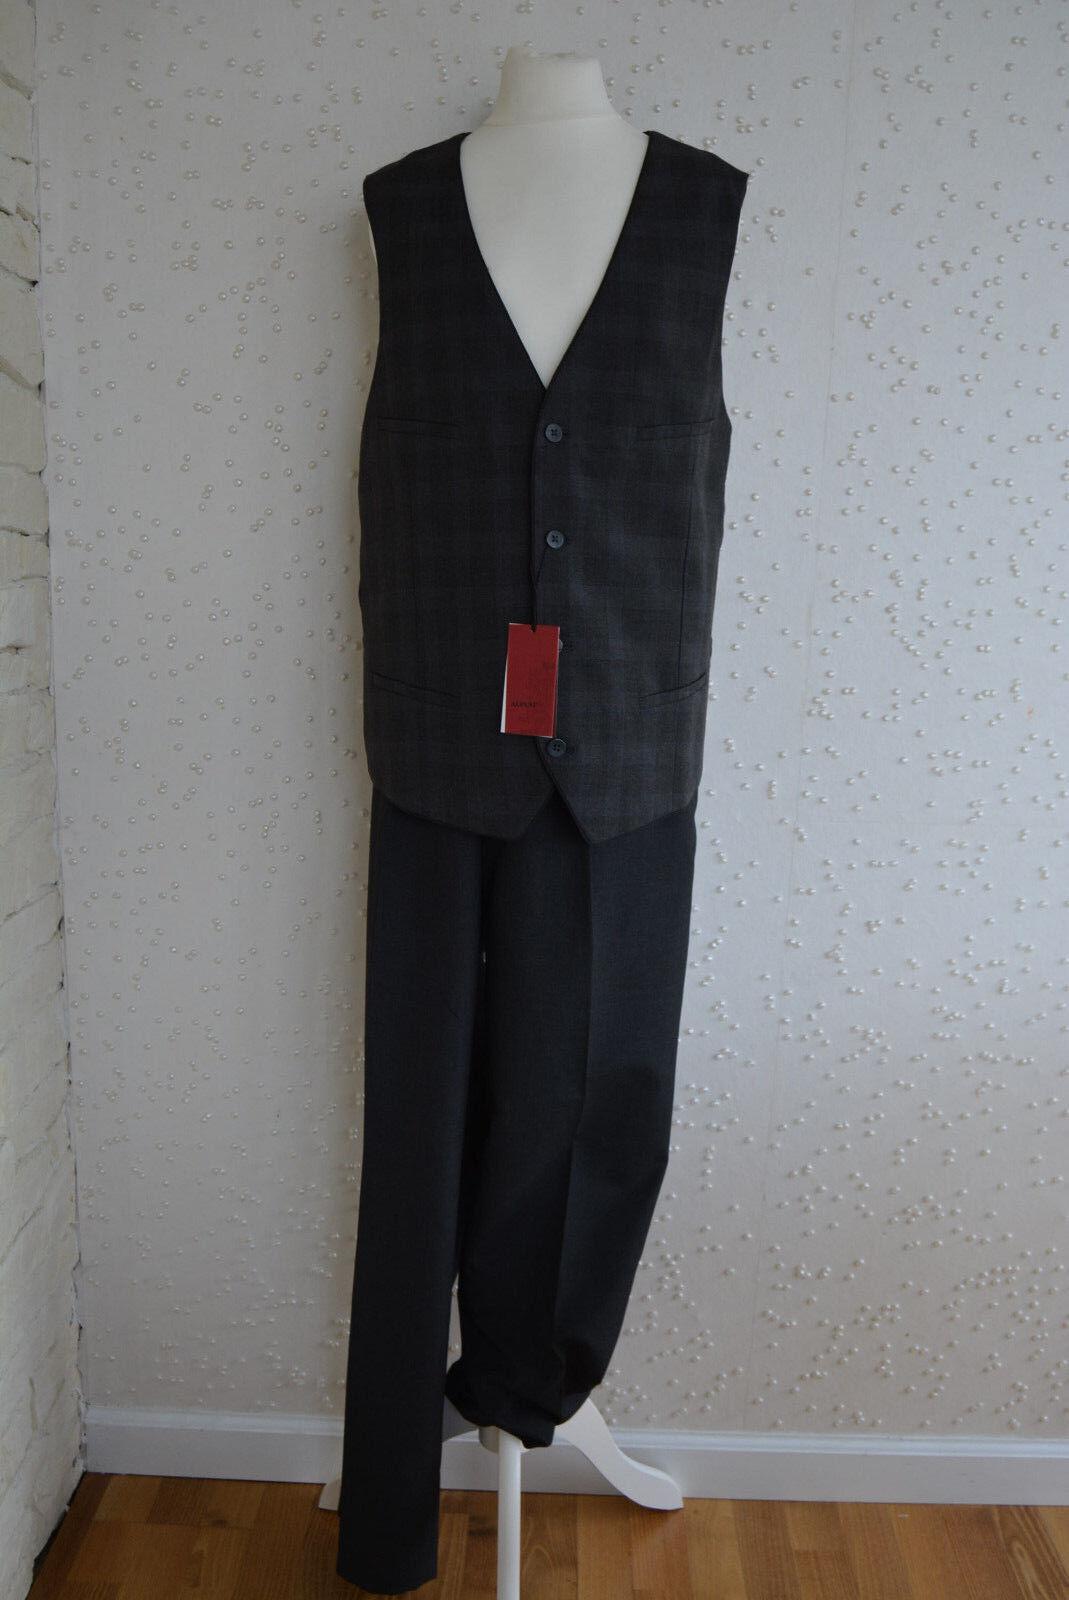 Anzug Weste + Hose Slim Fit von Alfani, Gr. M - 34W 32L, neu